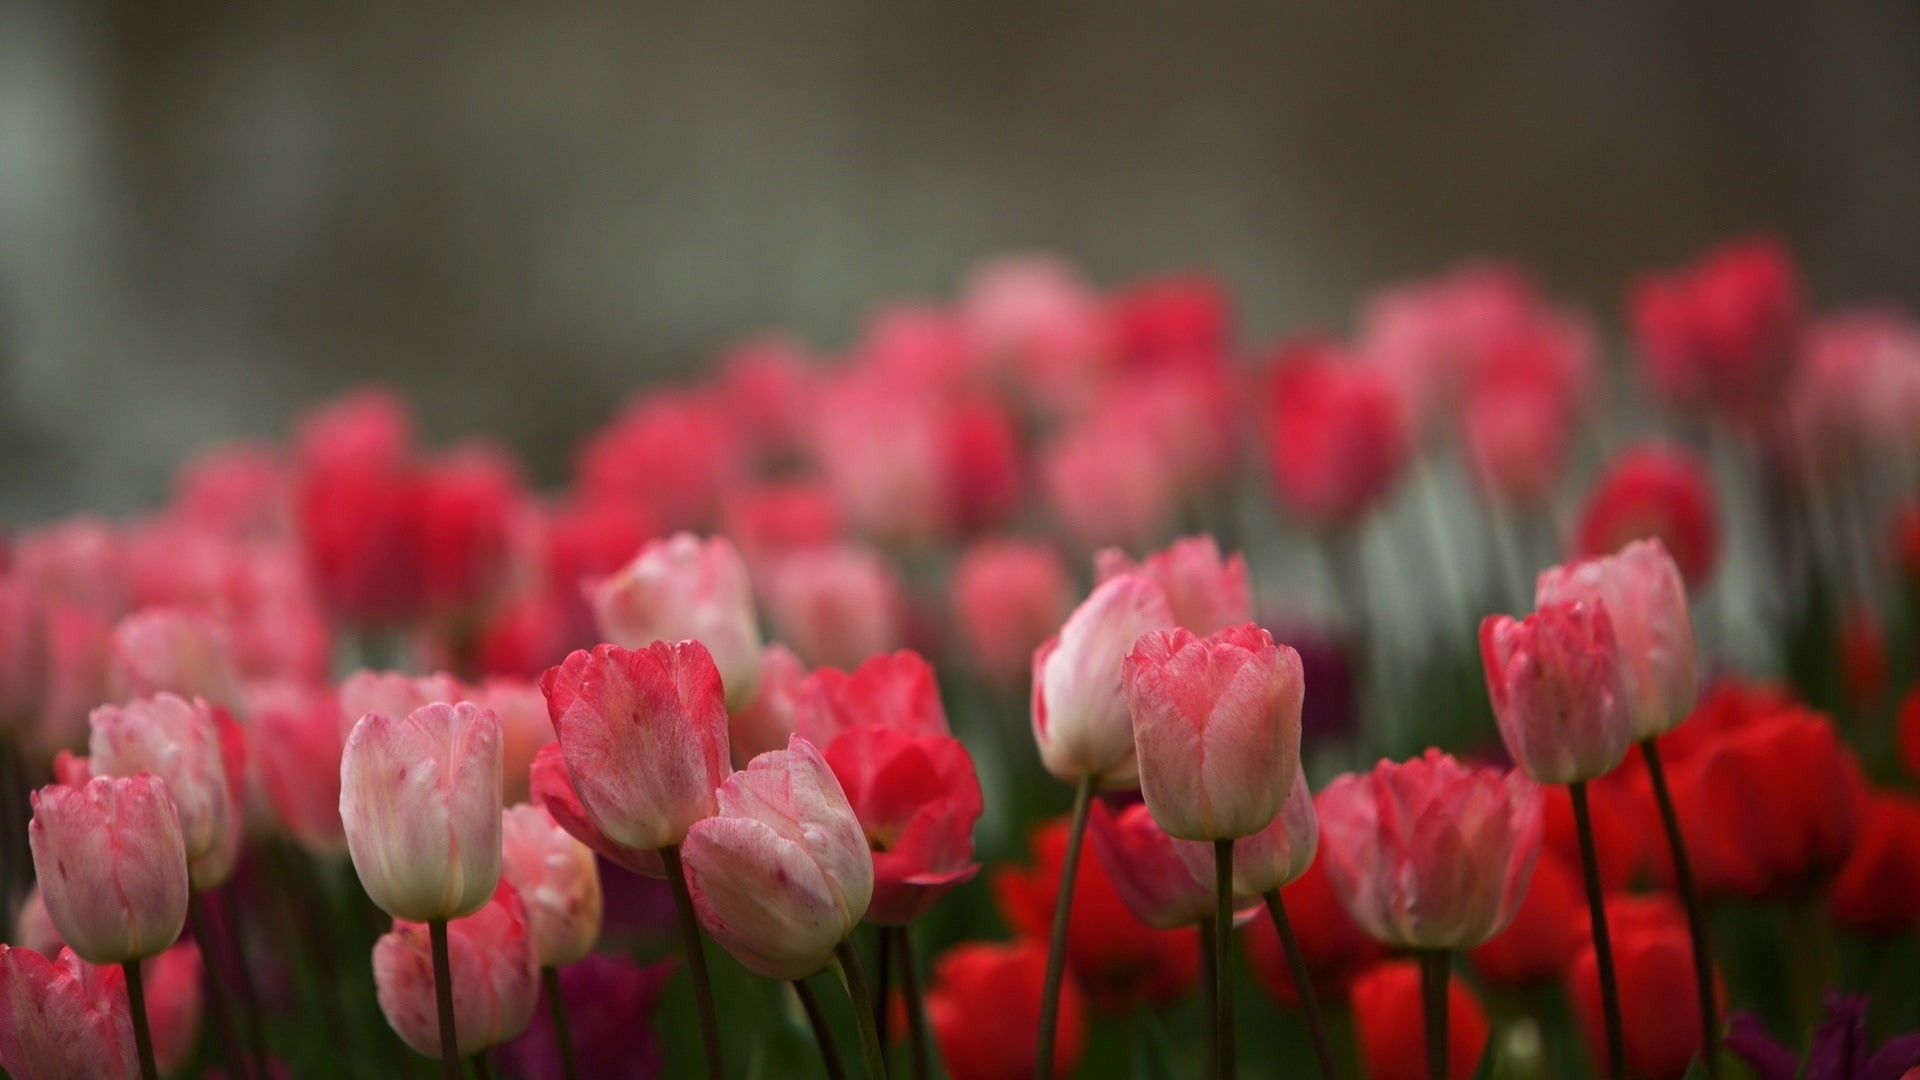 Pink tulip flowers in blur background HD Wallpaper